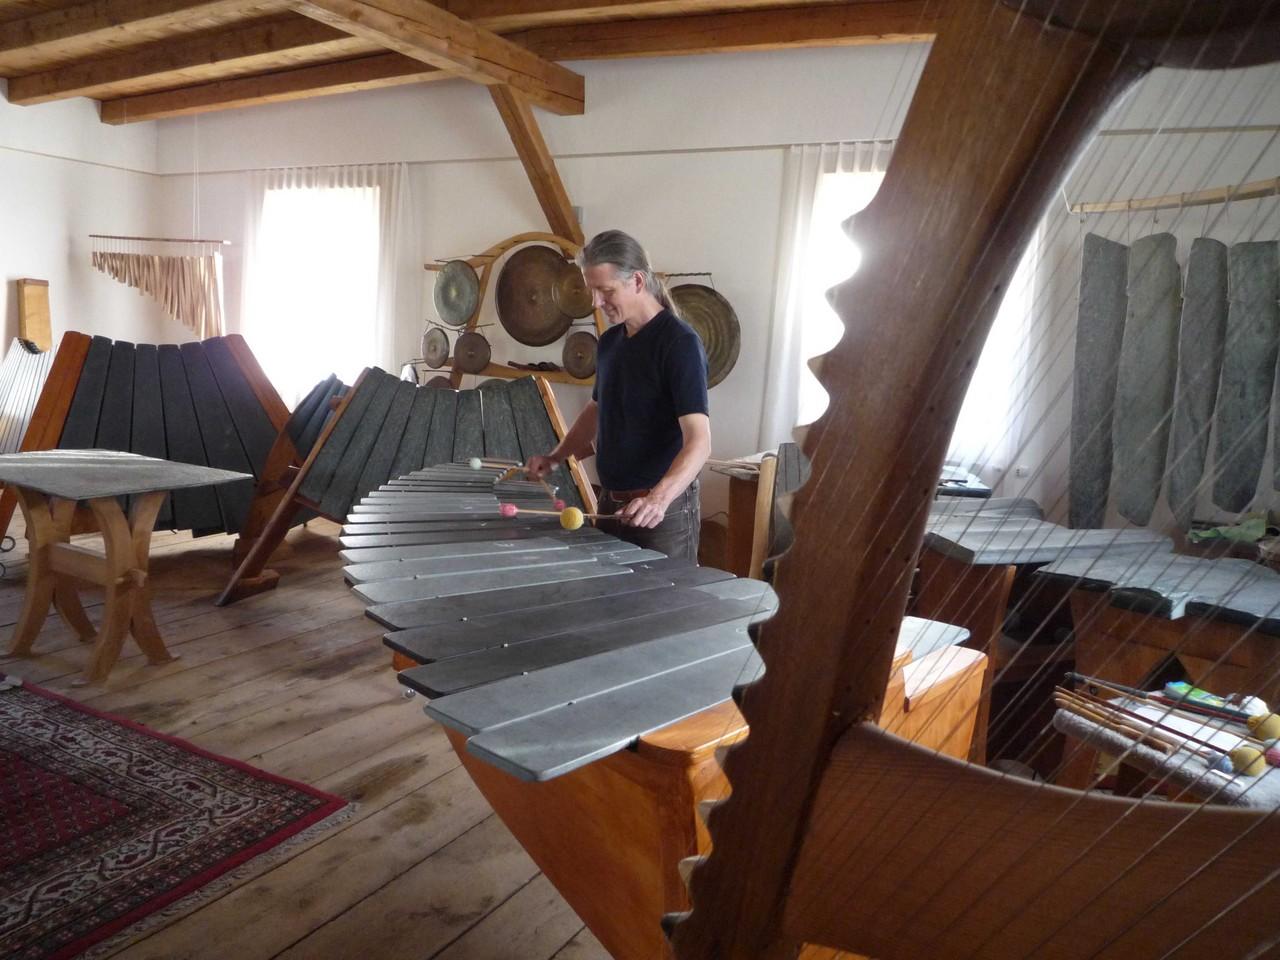 CD recording at Steinmusik Atelier, Heldswil, Switzerland